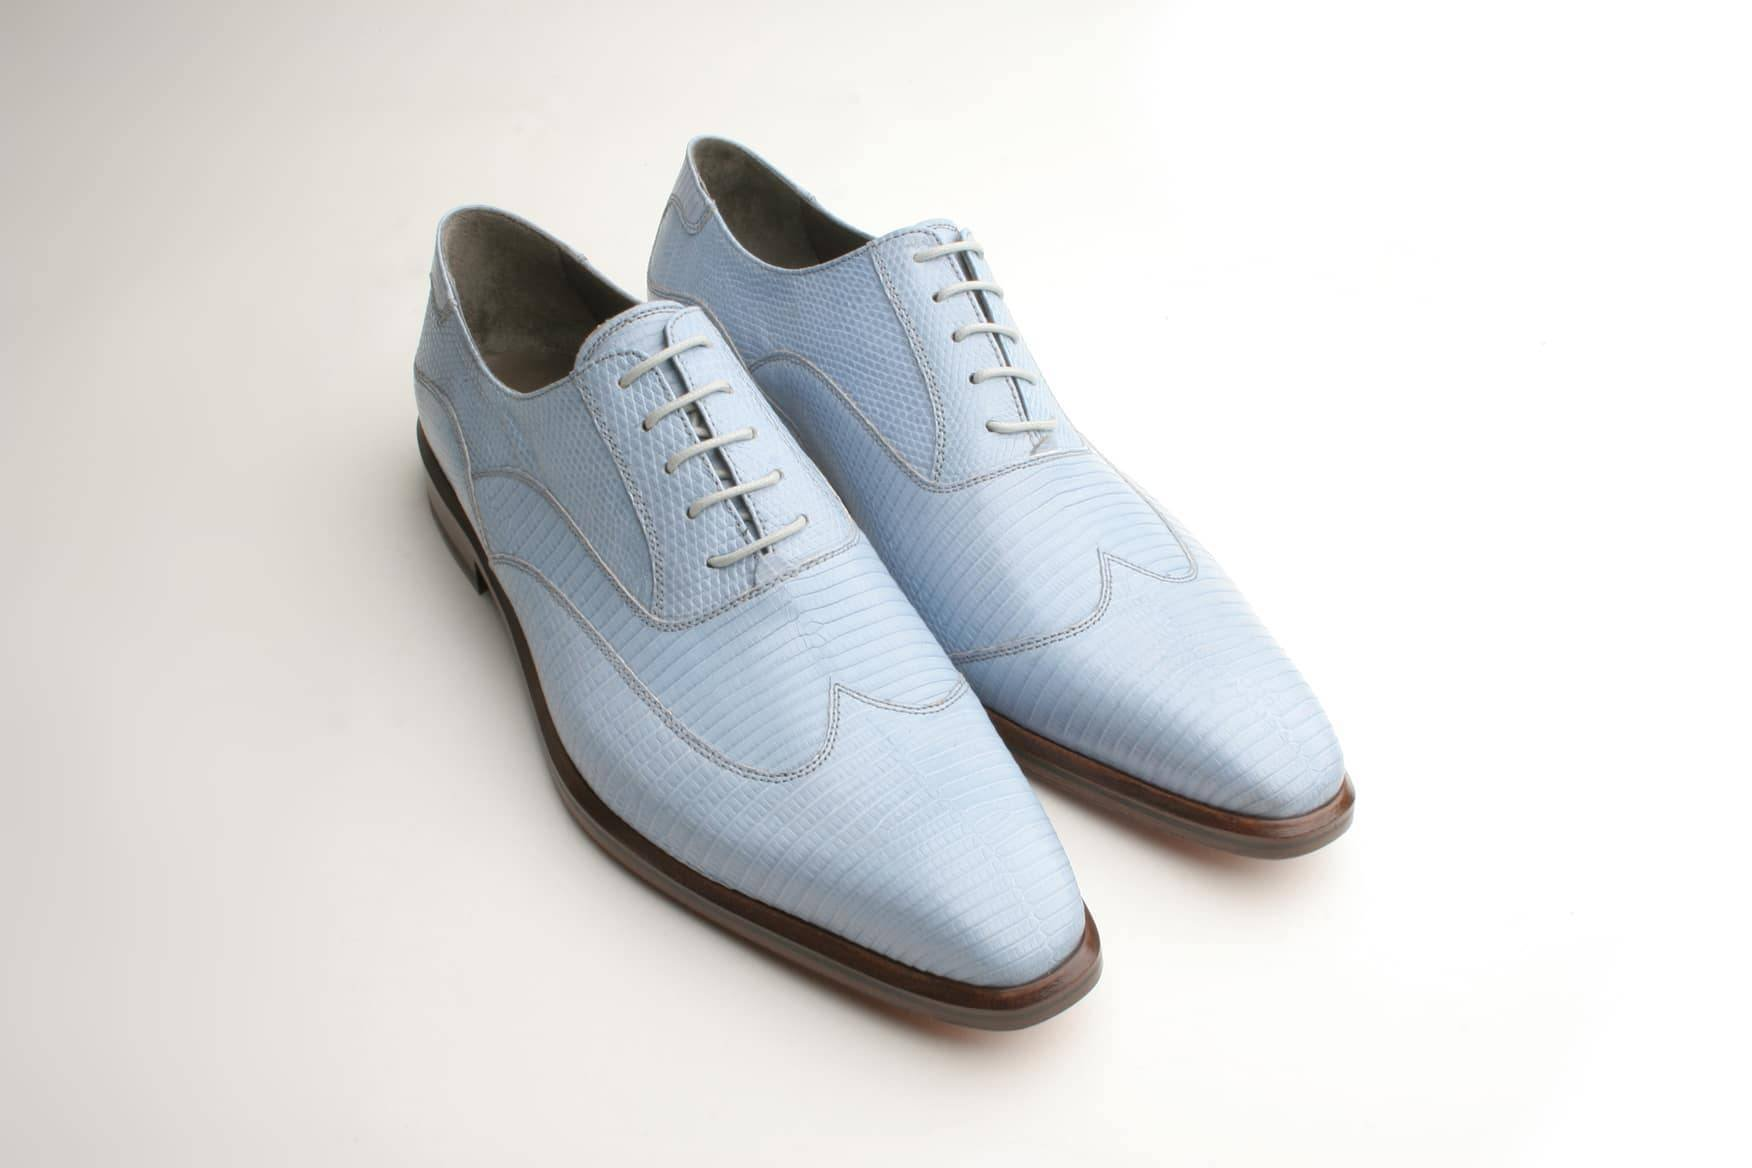 custom-made-shoe-croc